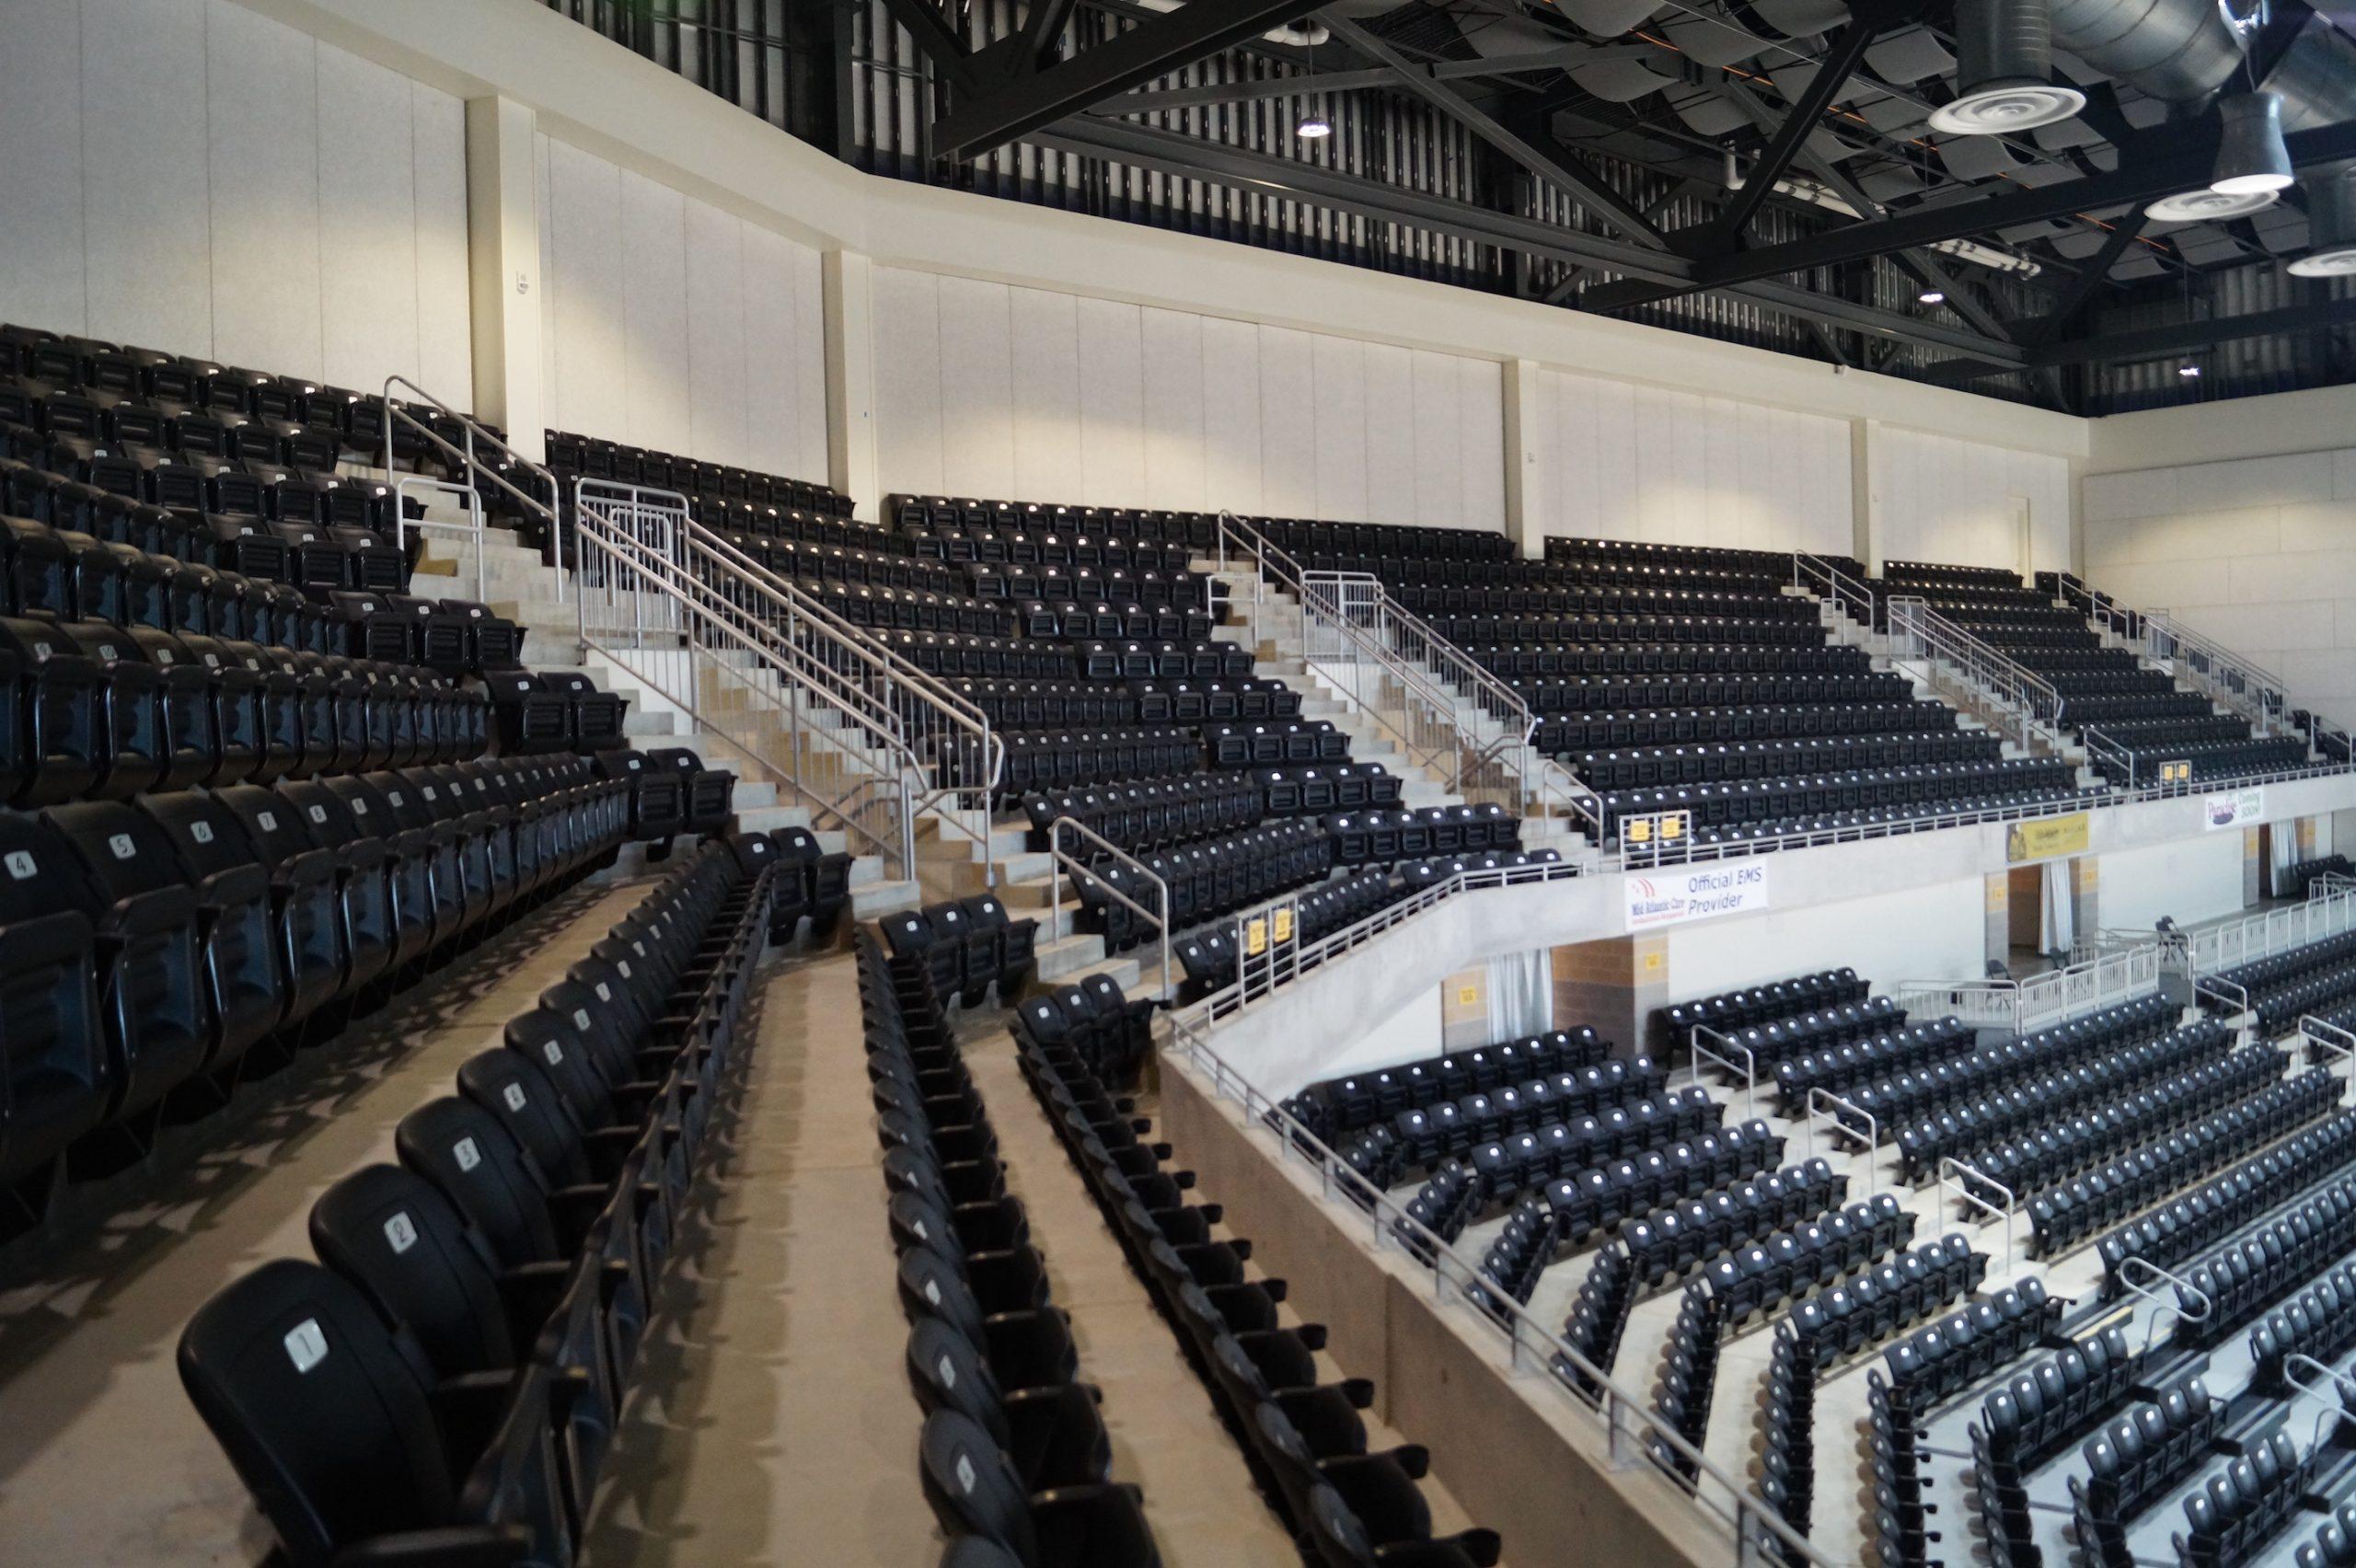 Stadium risers and seats at UMBC's basketball stadium